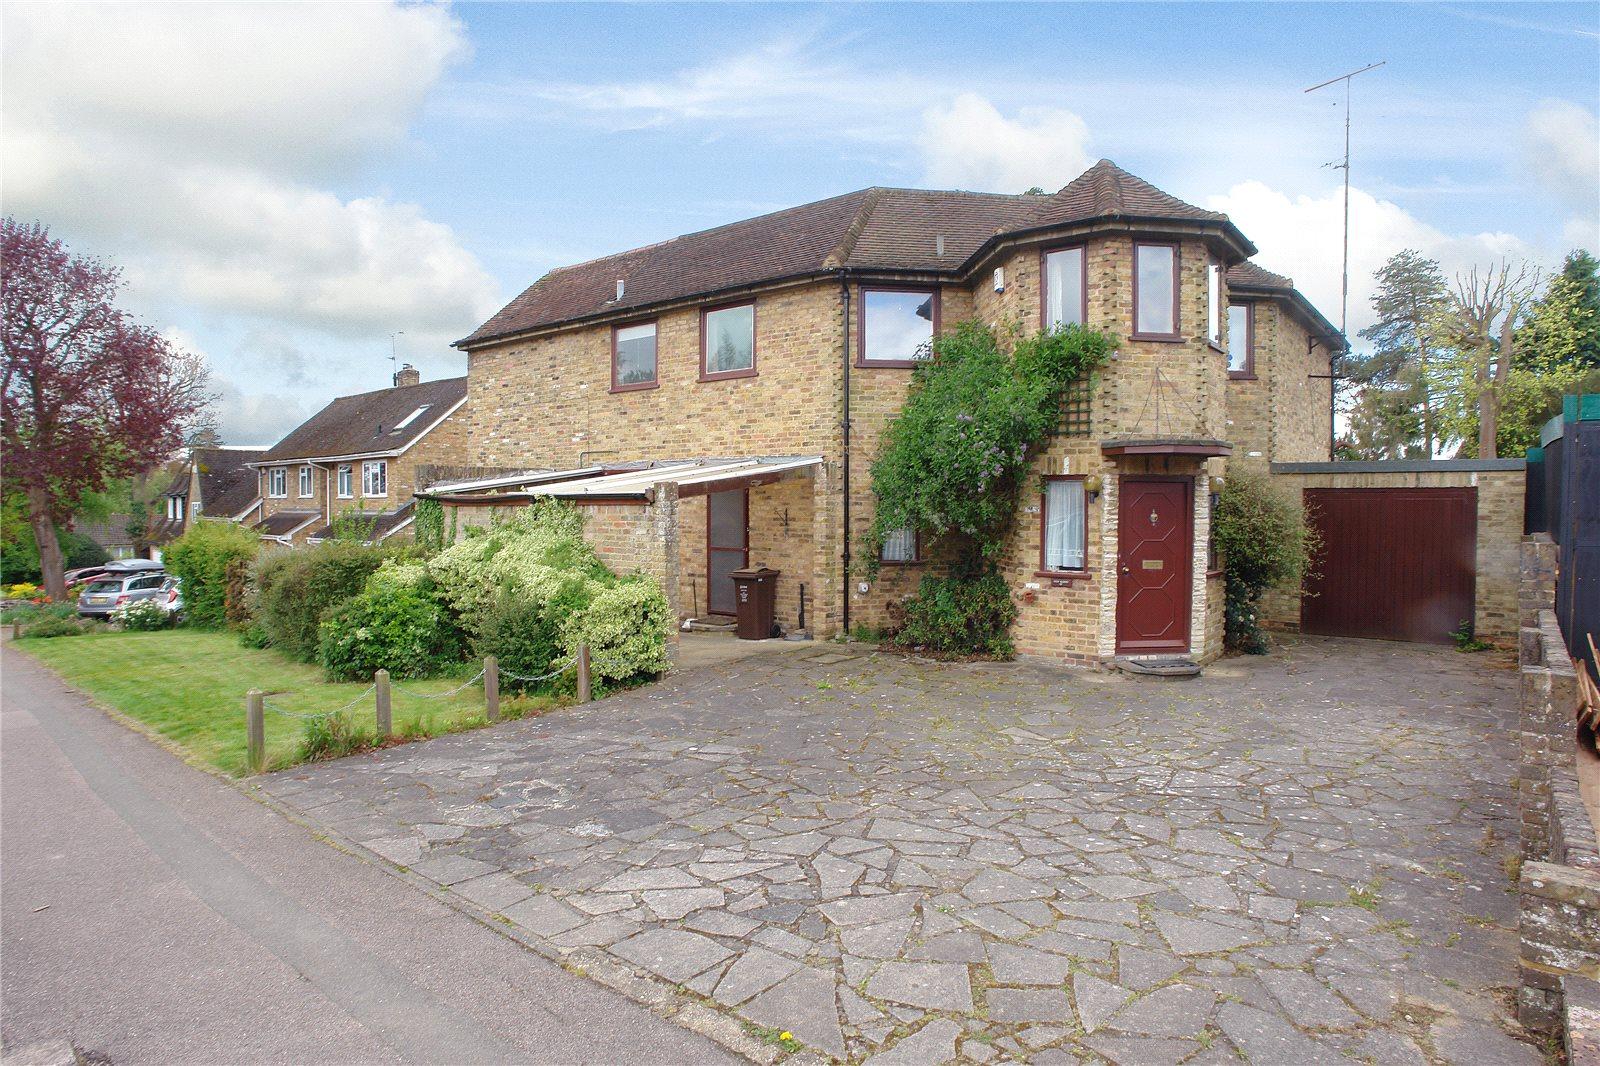 Moradia para Venda às Alders End Lane, Harpenden, Hertfordshire, AL5 Harpenden, Inglaterra